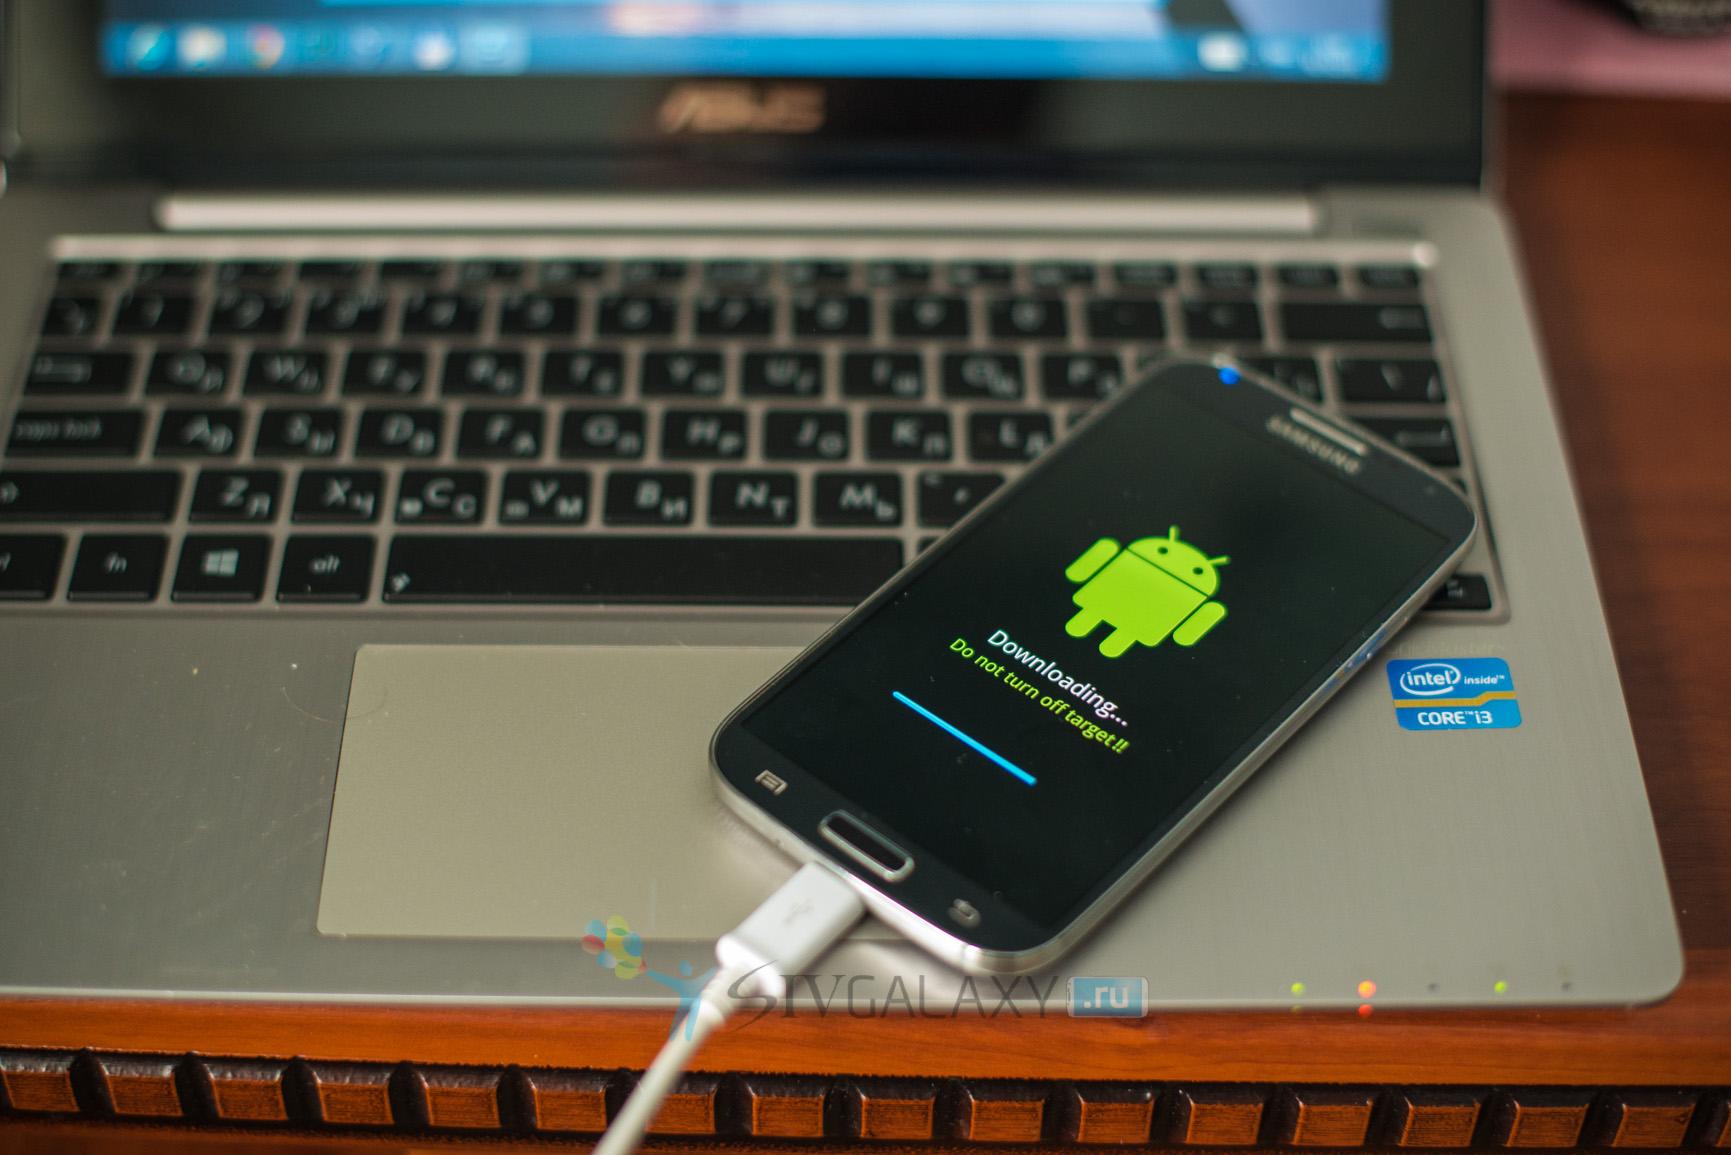 Как прошить Samsung Galaxy S4 на Android 4.3